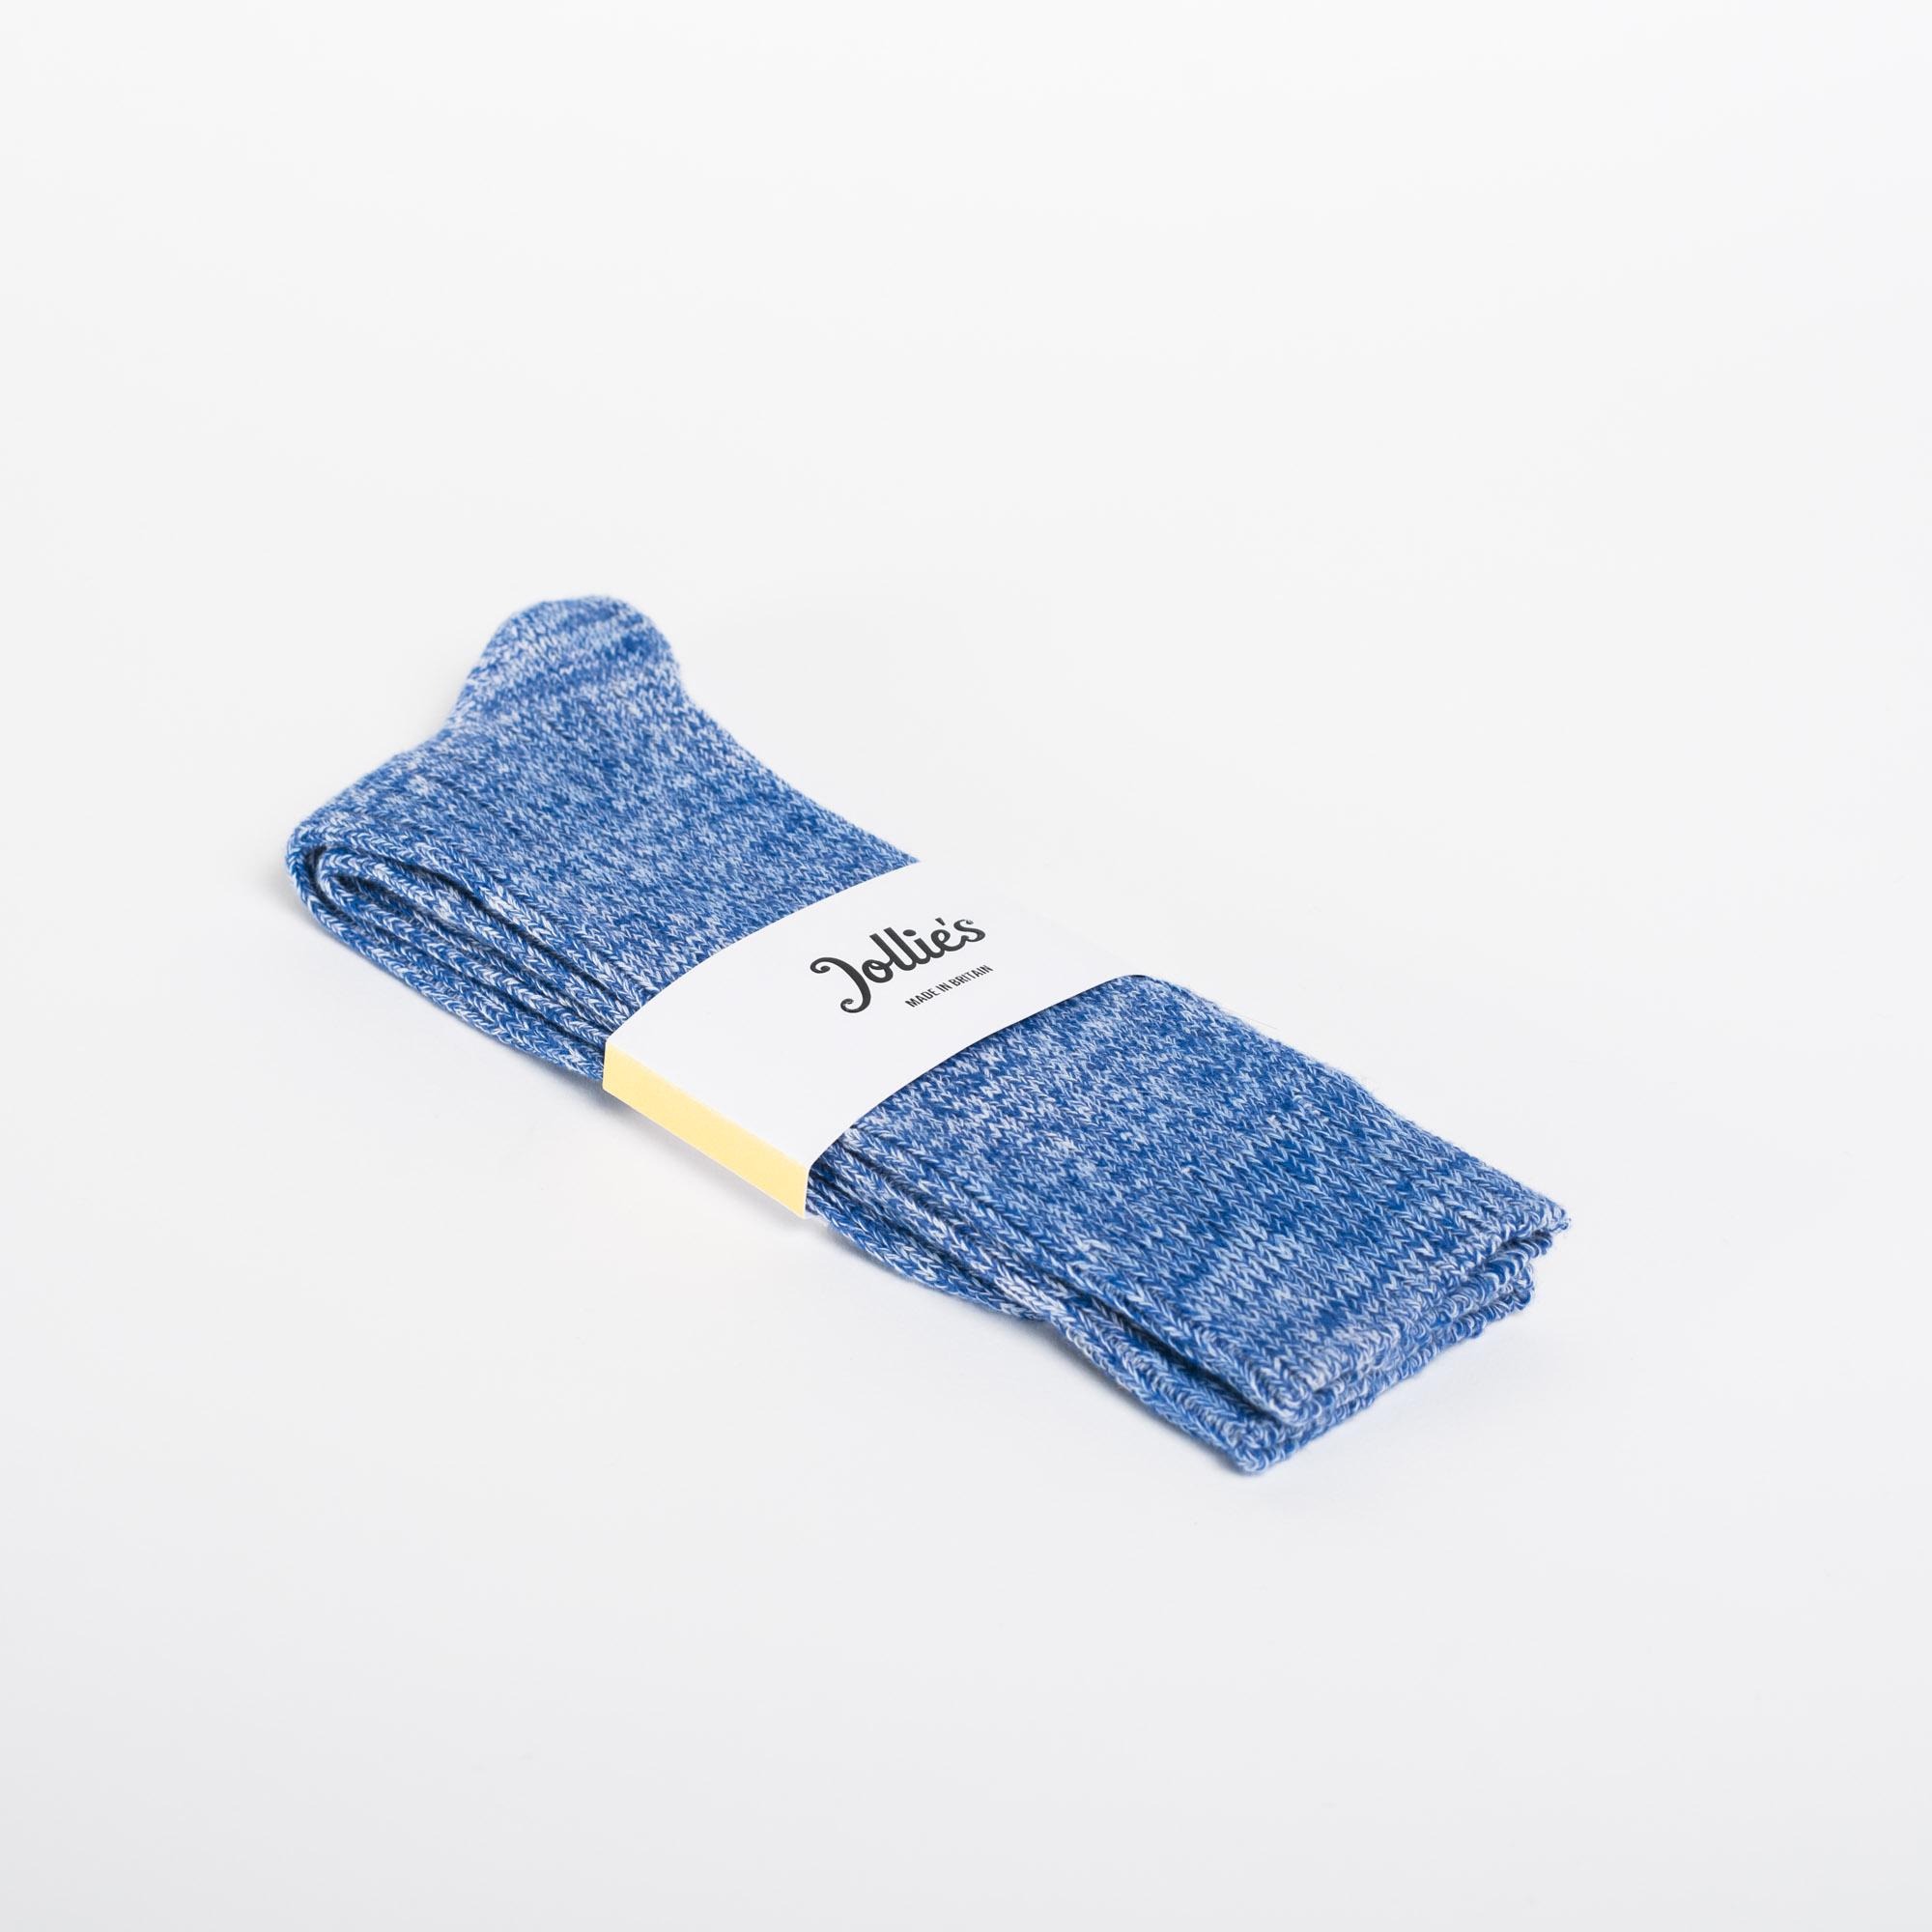 Jollie's twister socks